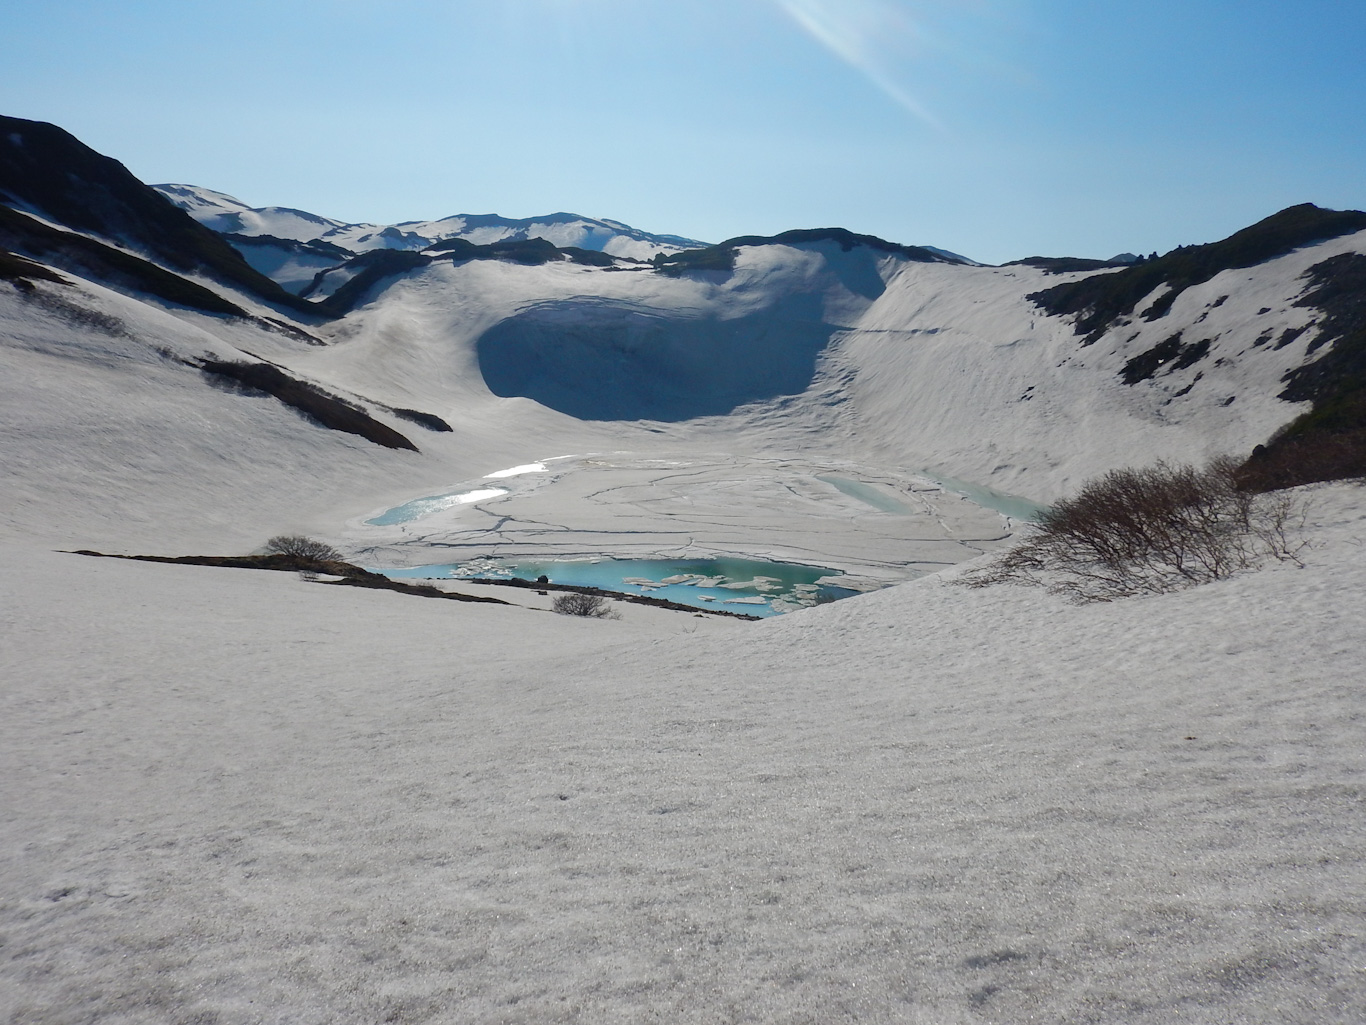 Озеро в кратере. Парамушир июль 2018